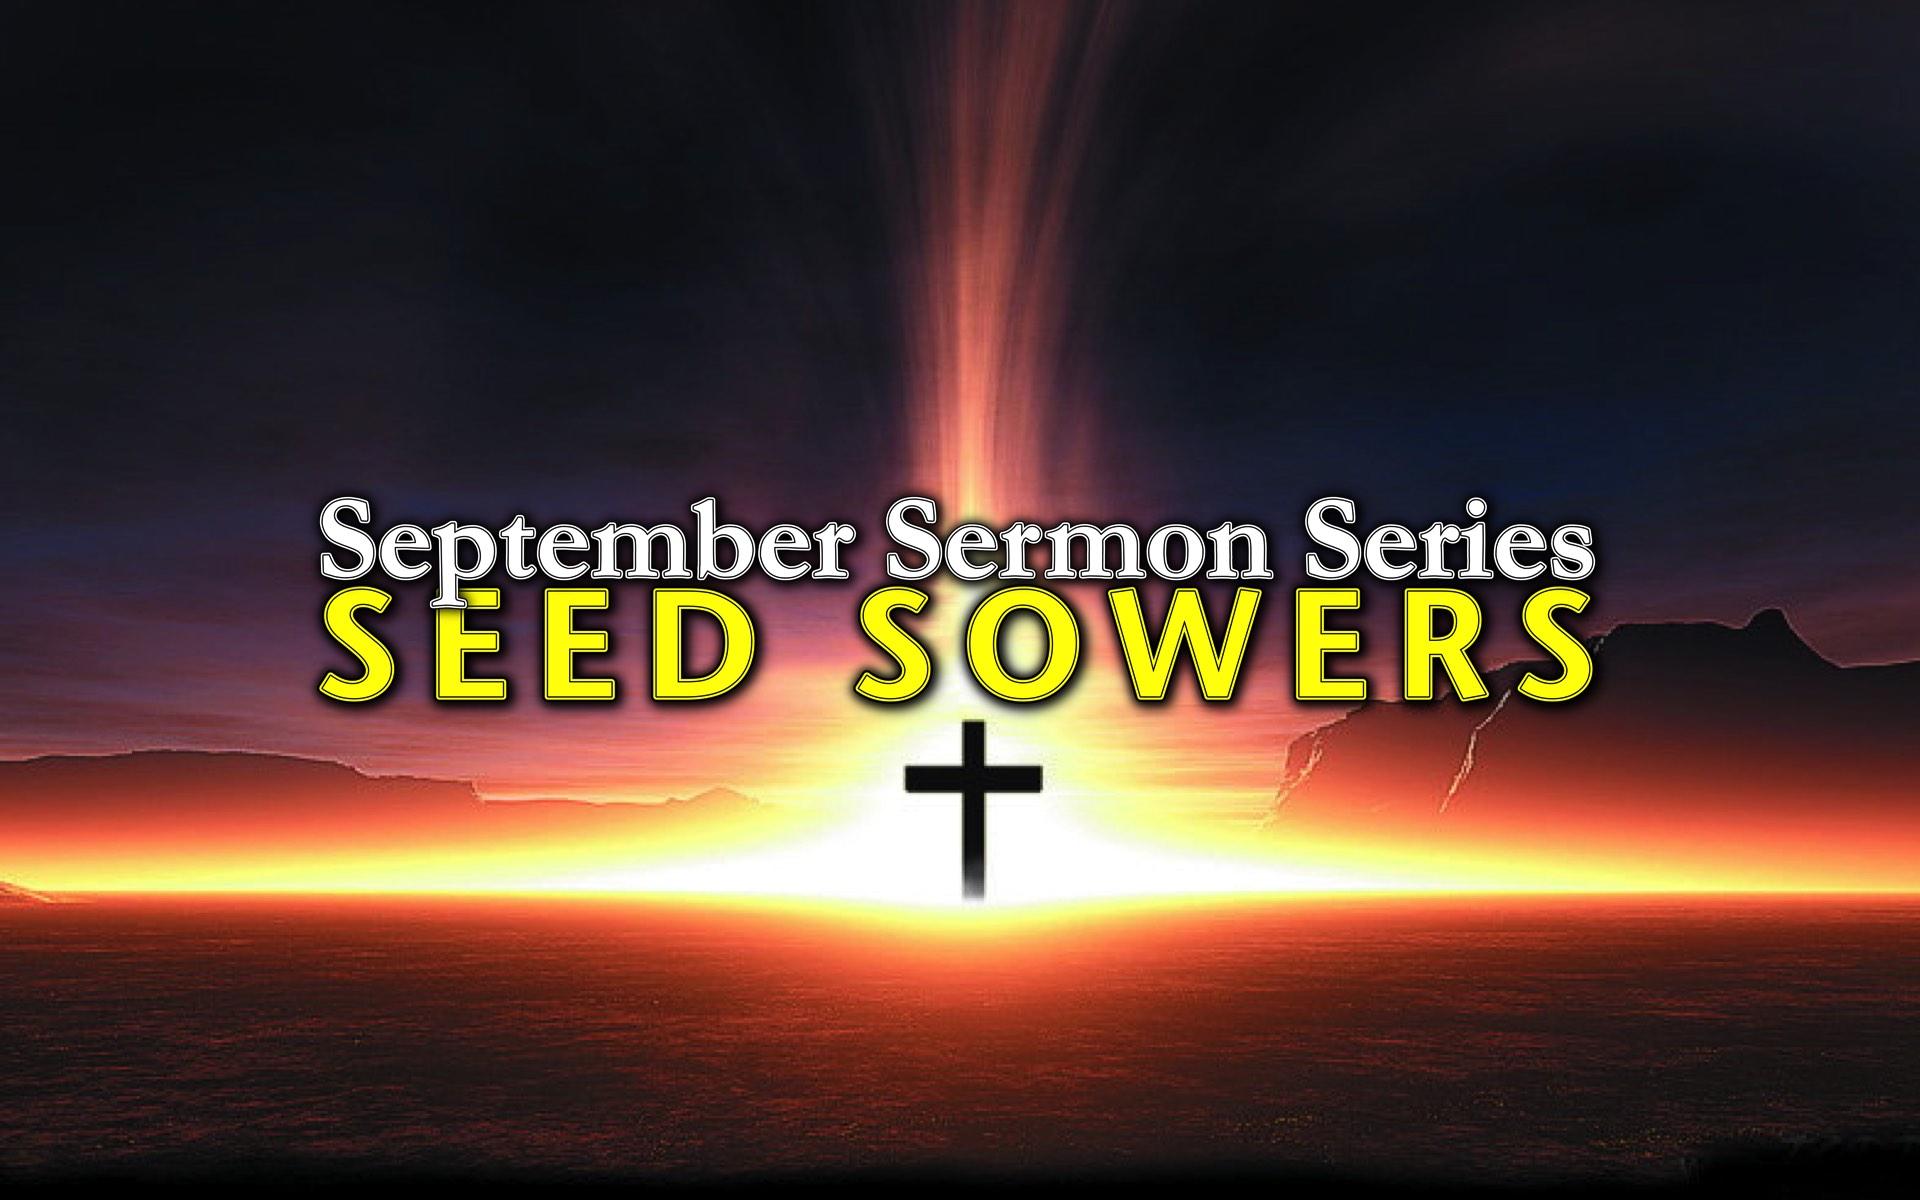 Seed Sowers – 2015 September Sermon Series